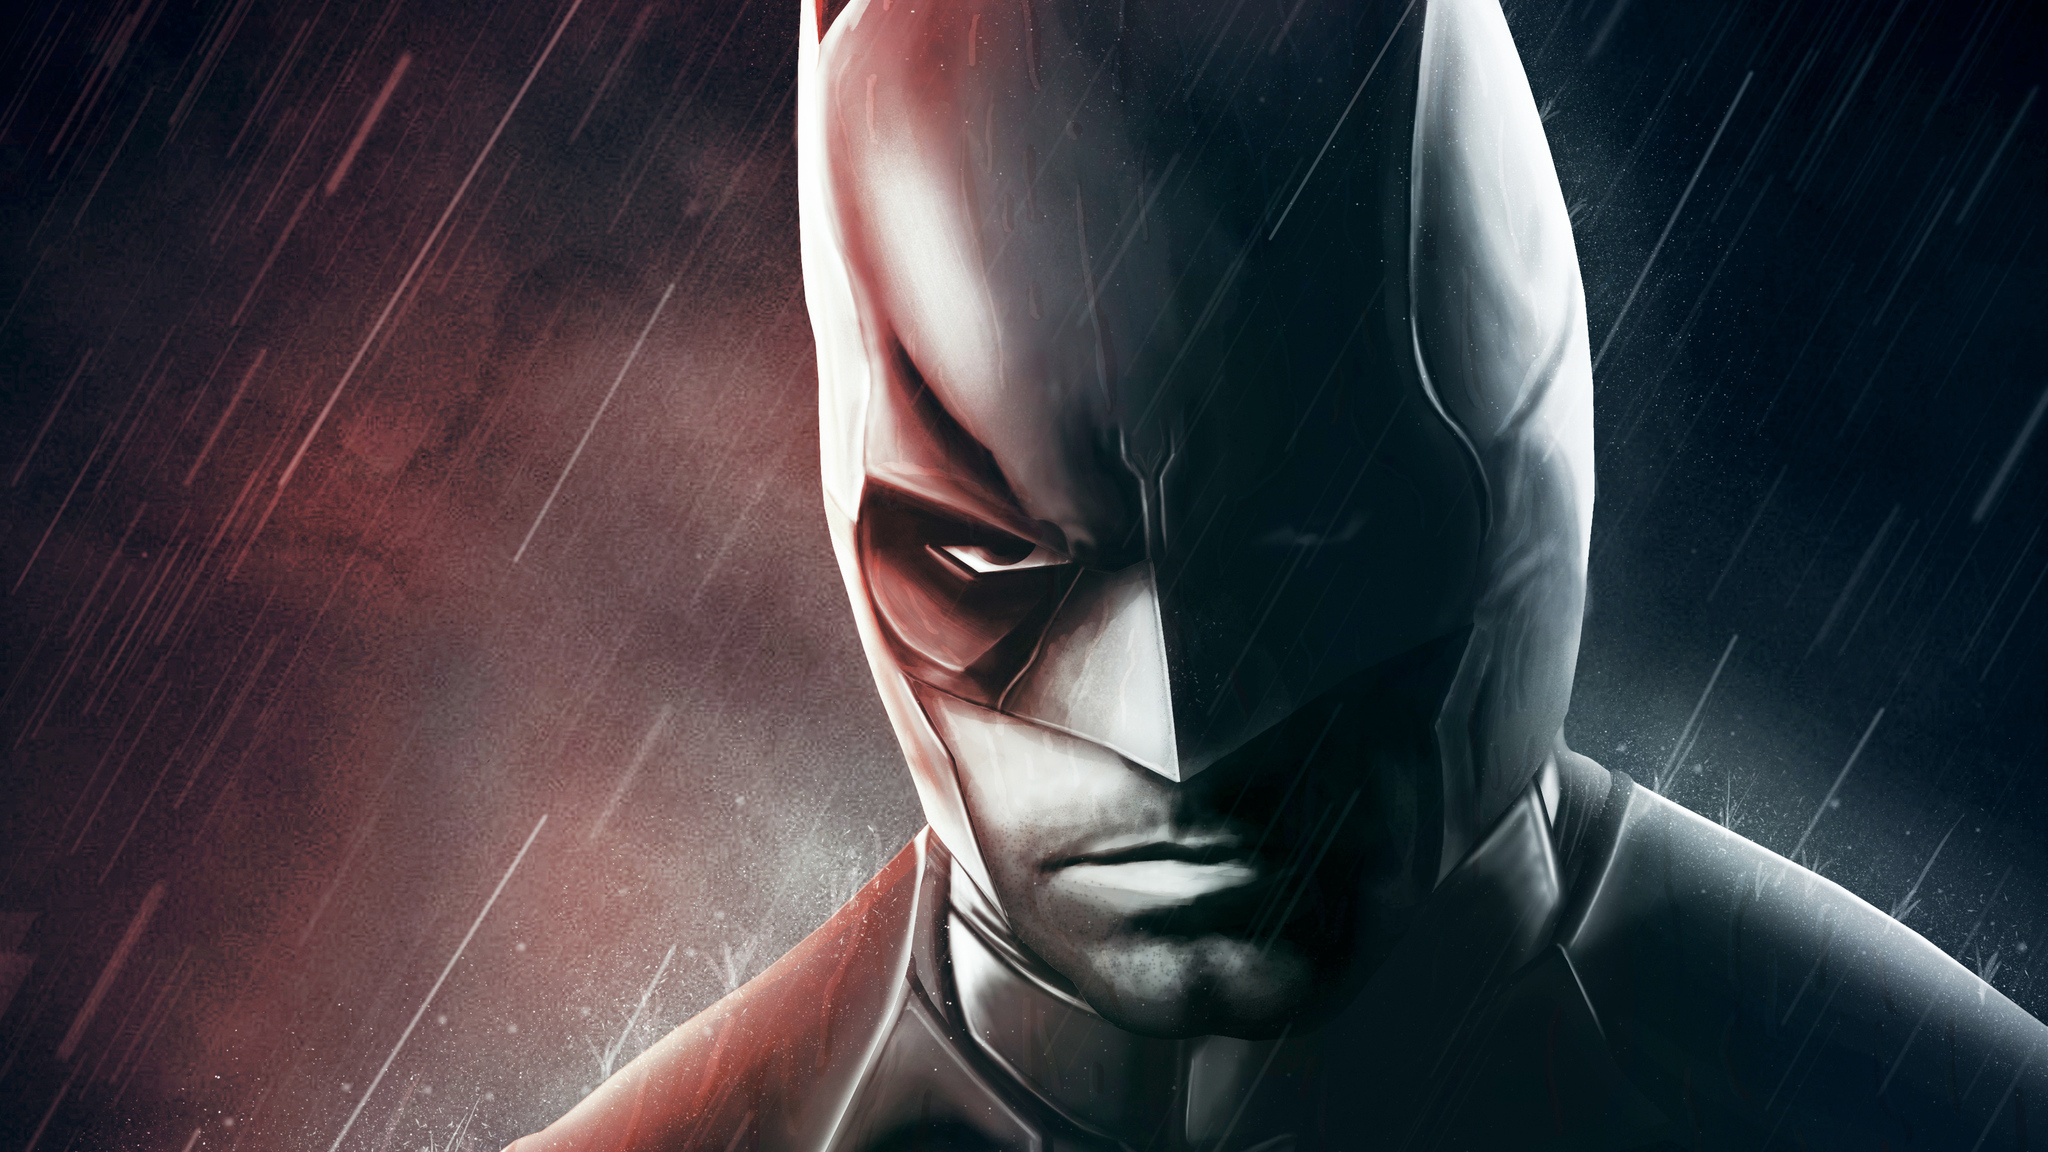 2048x1152 Black And White Batman 2048x1152 Resolution Hd 4k